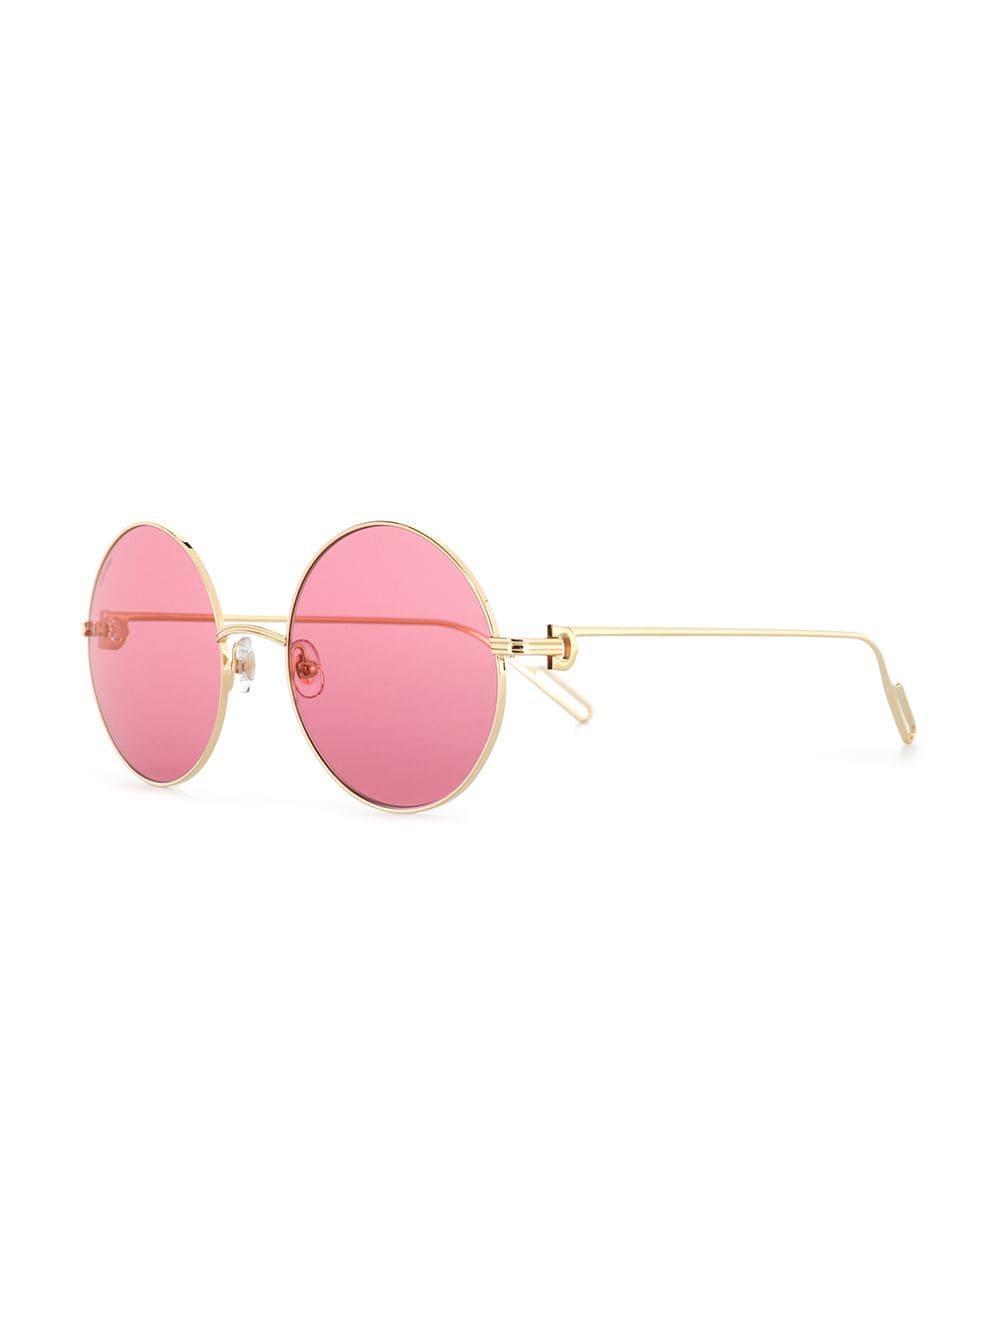 3c8028d8b09 Cartier - Metallic Circle Frame Sunglasses - Lyst. View fullscreen